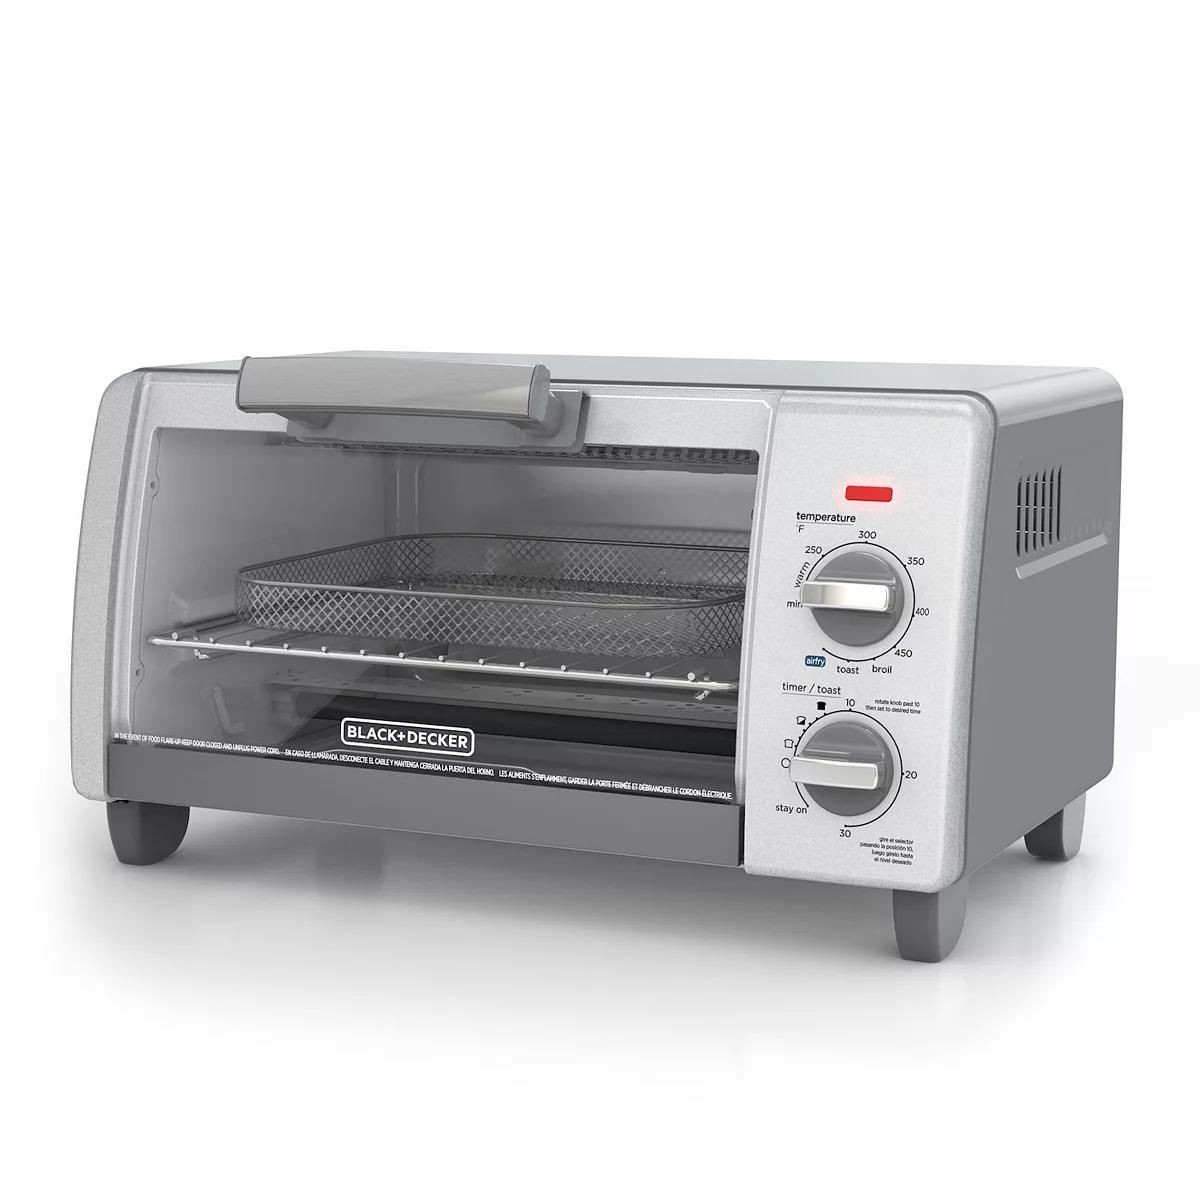 BLACK+DECKER™ Crisp 'N Bake Air Fry 4-Slice Toaster Oven TO1785SG